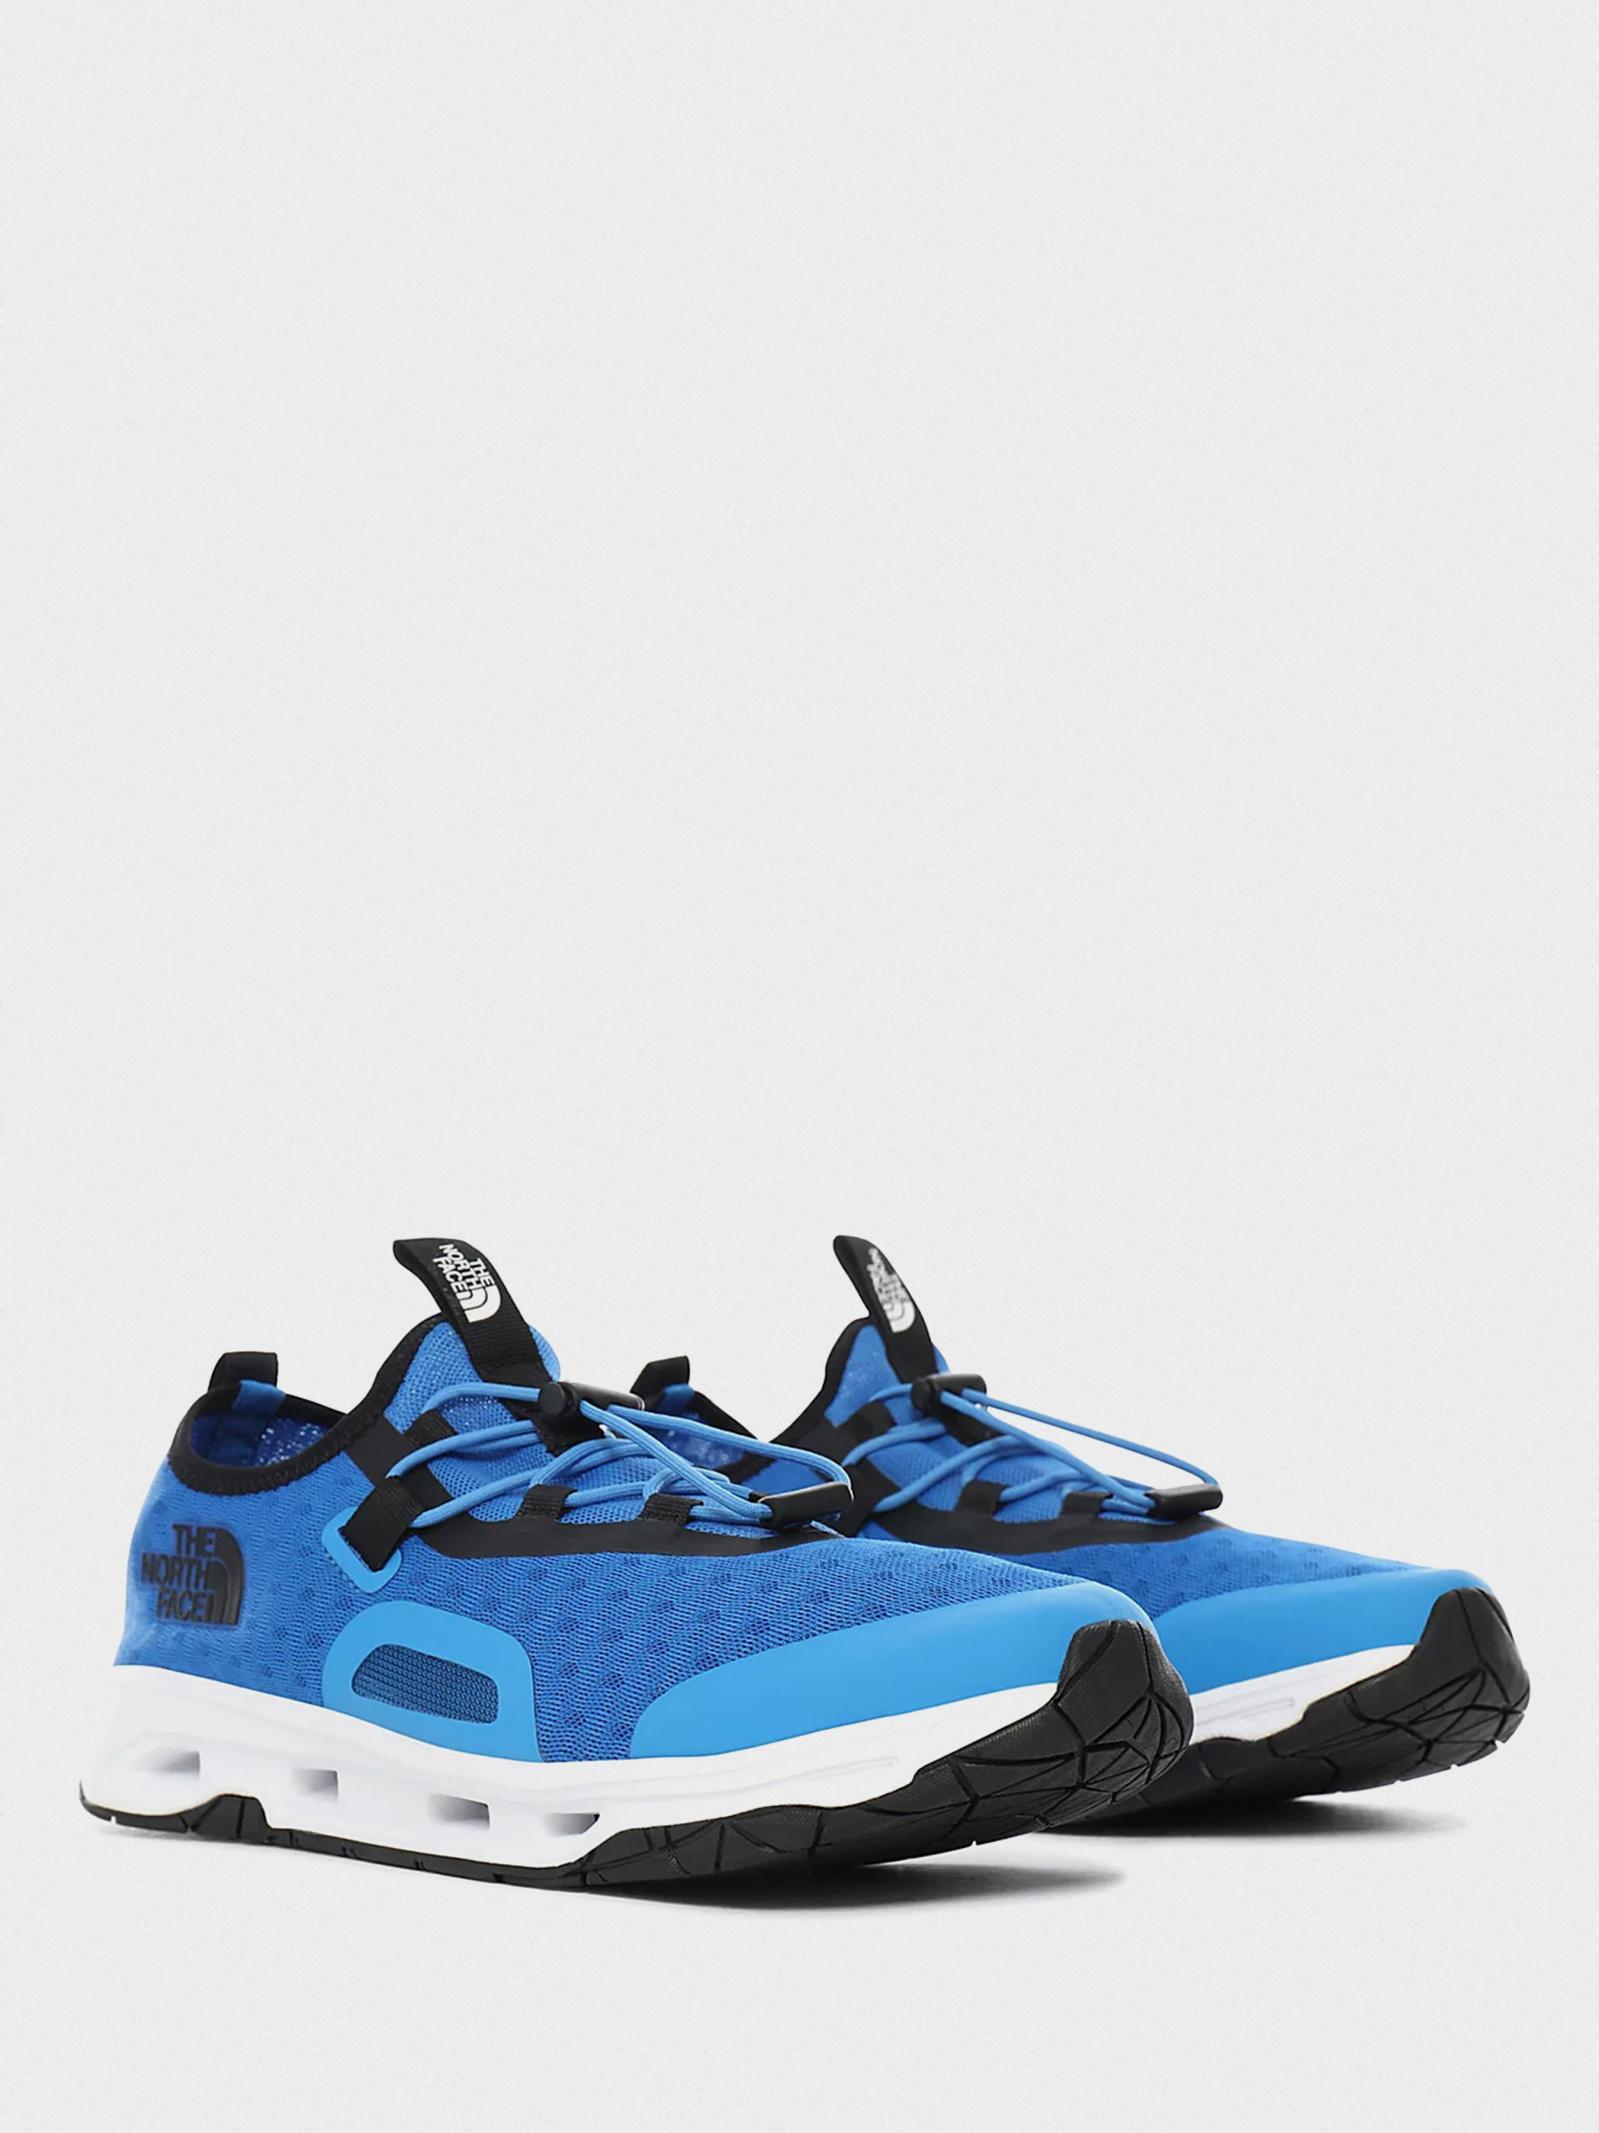 Кросівки  для чоловіків The North Face Men's Skagit Water Shoe NF0A48MAME91 ціна взуття, 2017